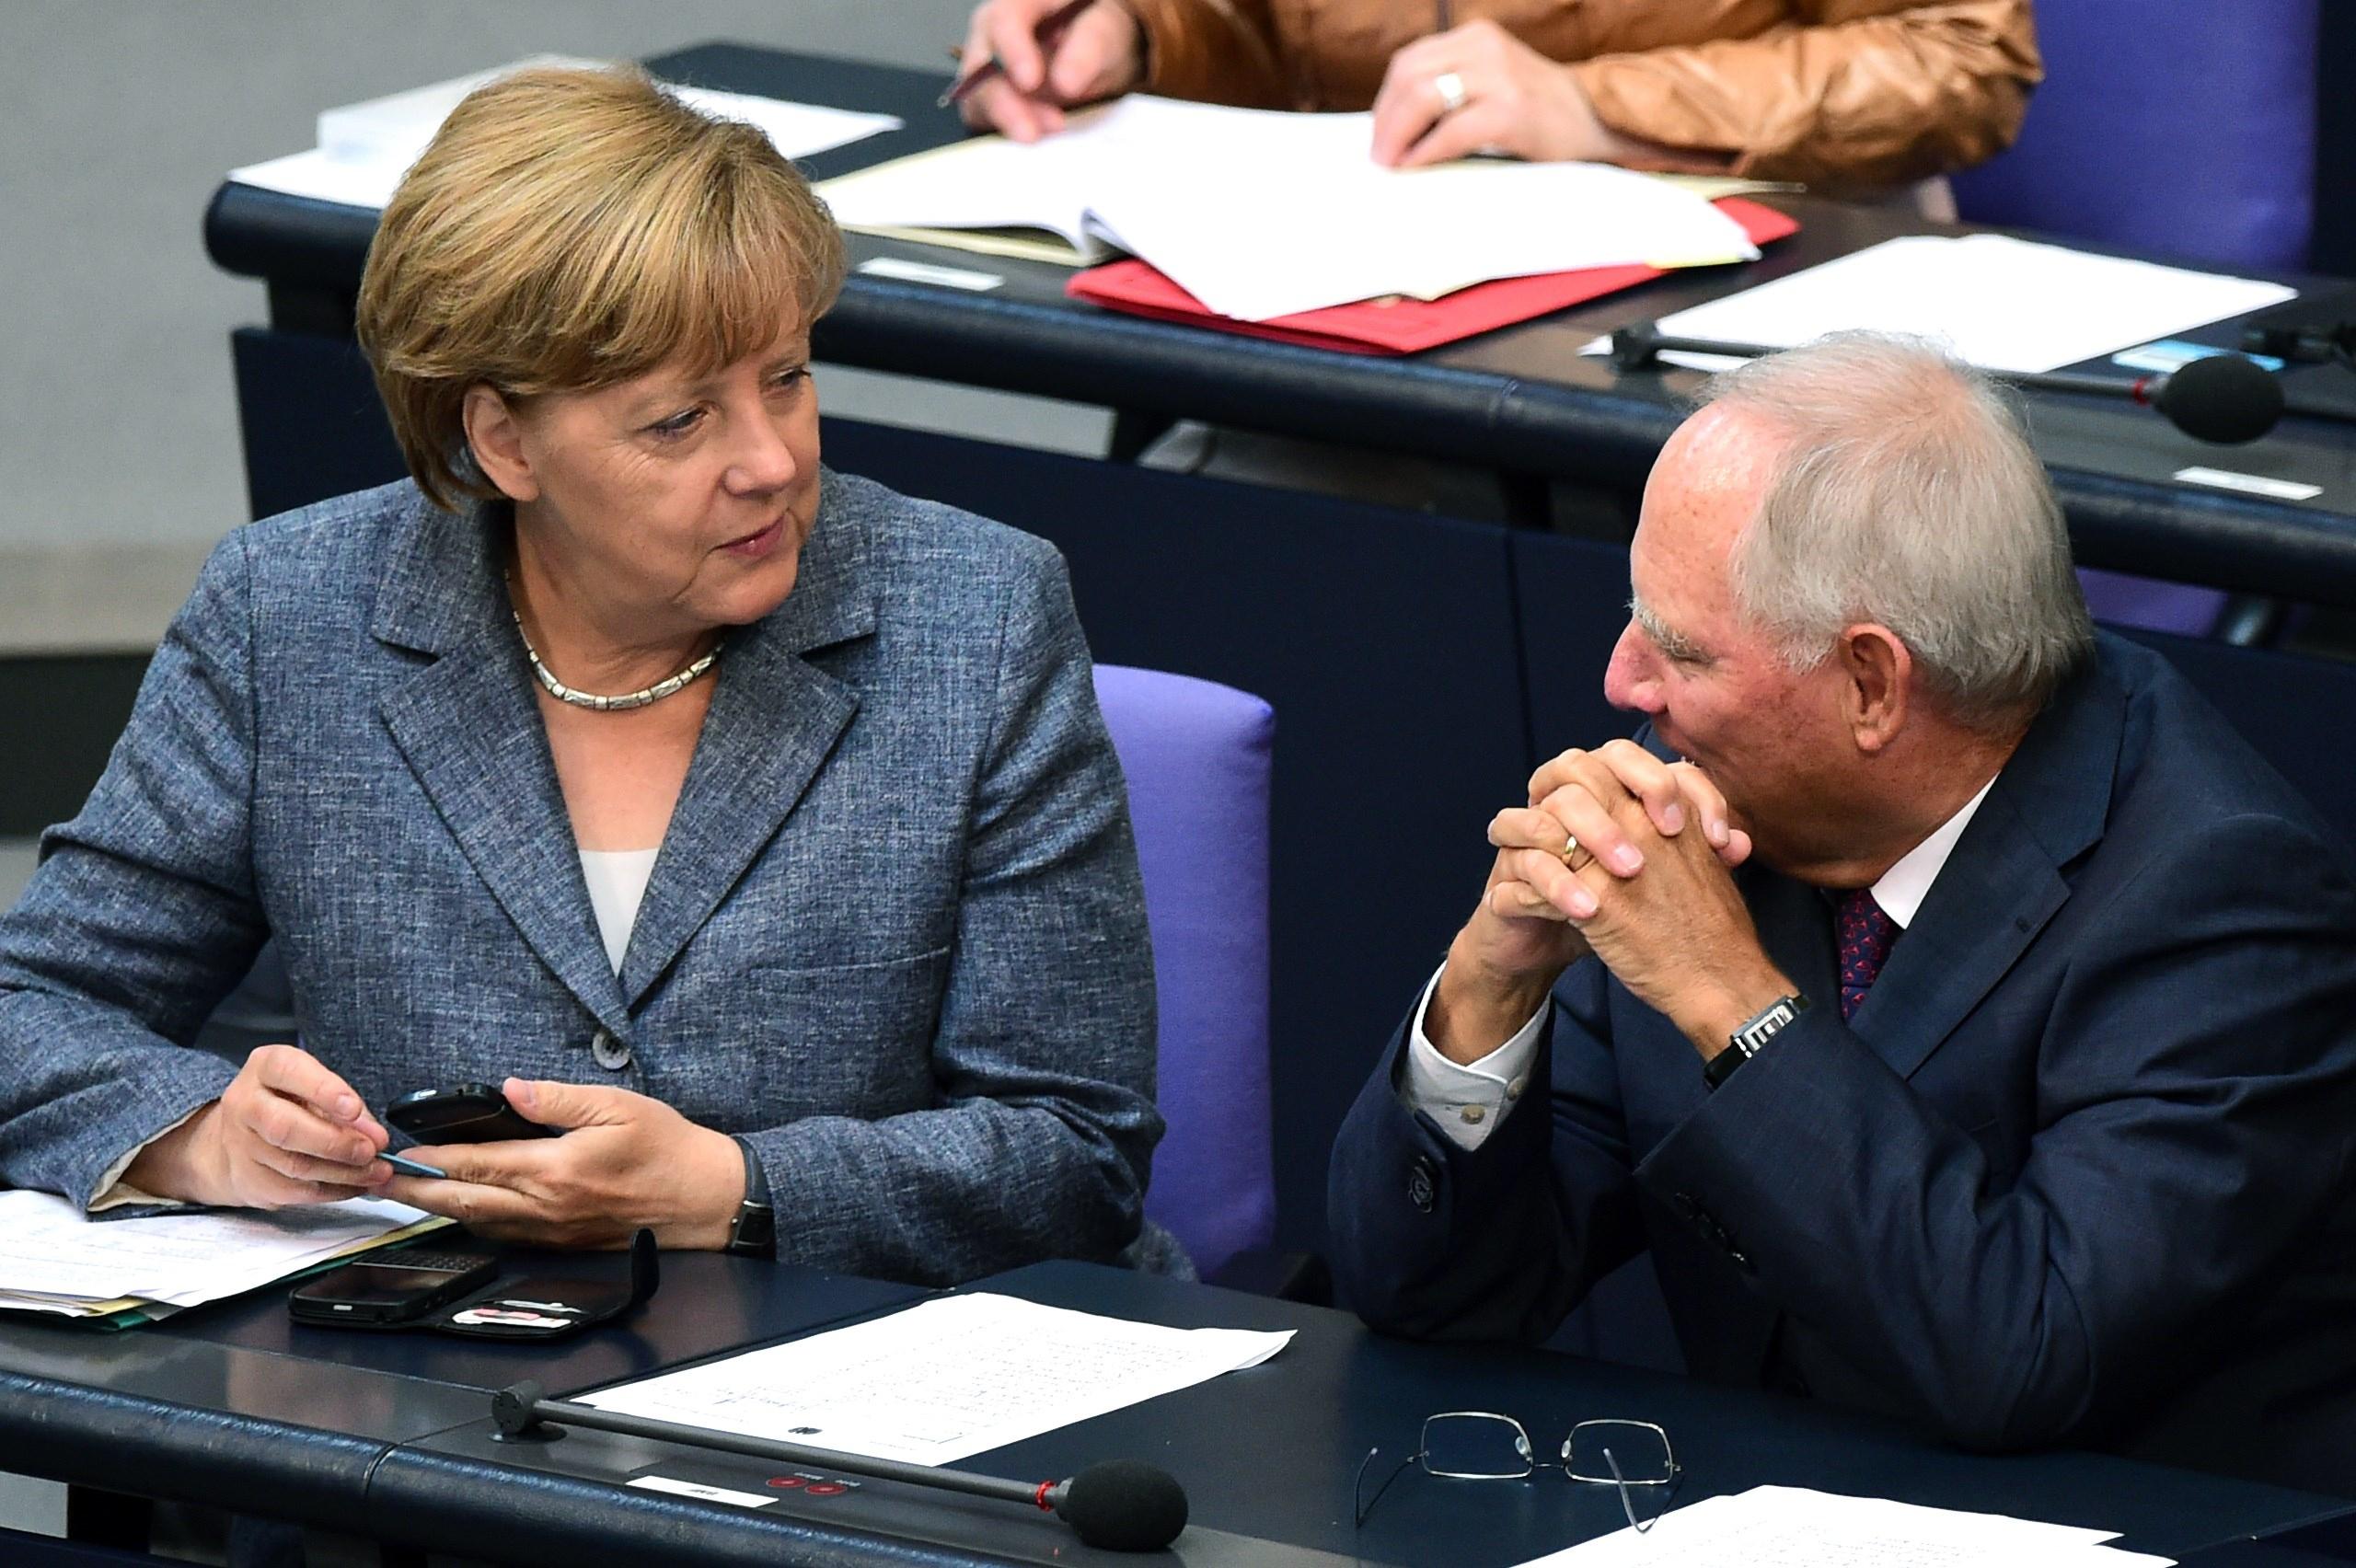 GERMANY-GREECE-EU-POLITICS-DEBT